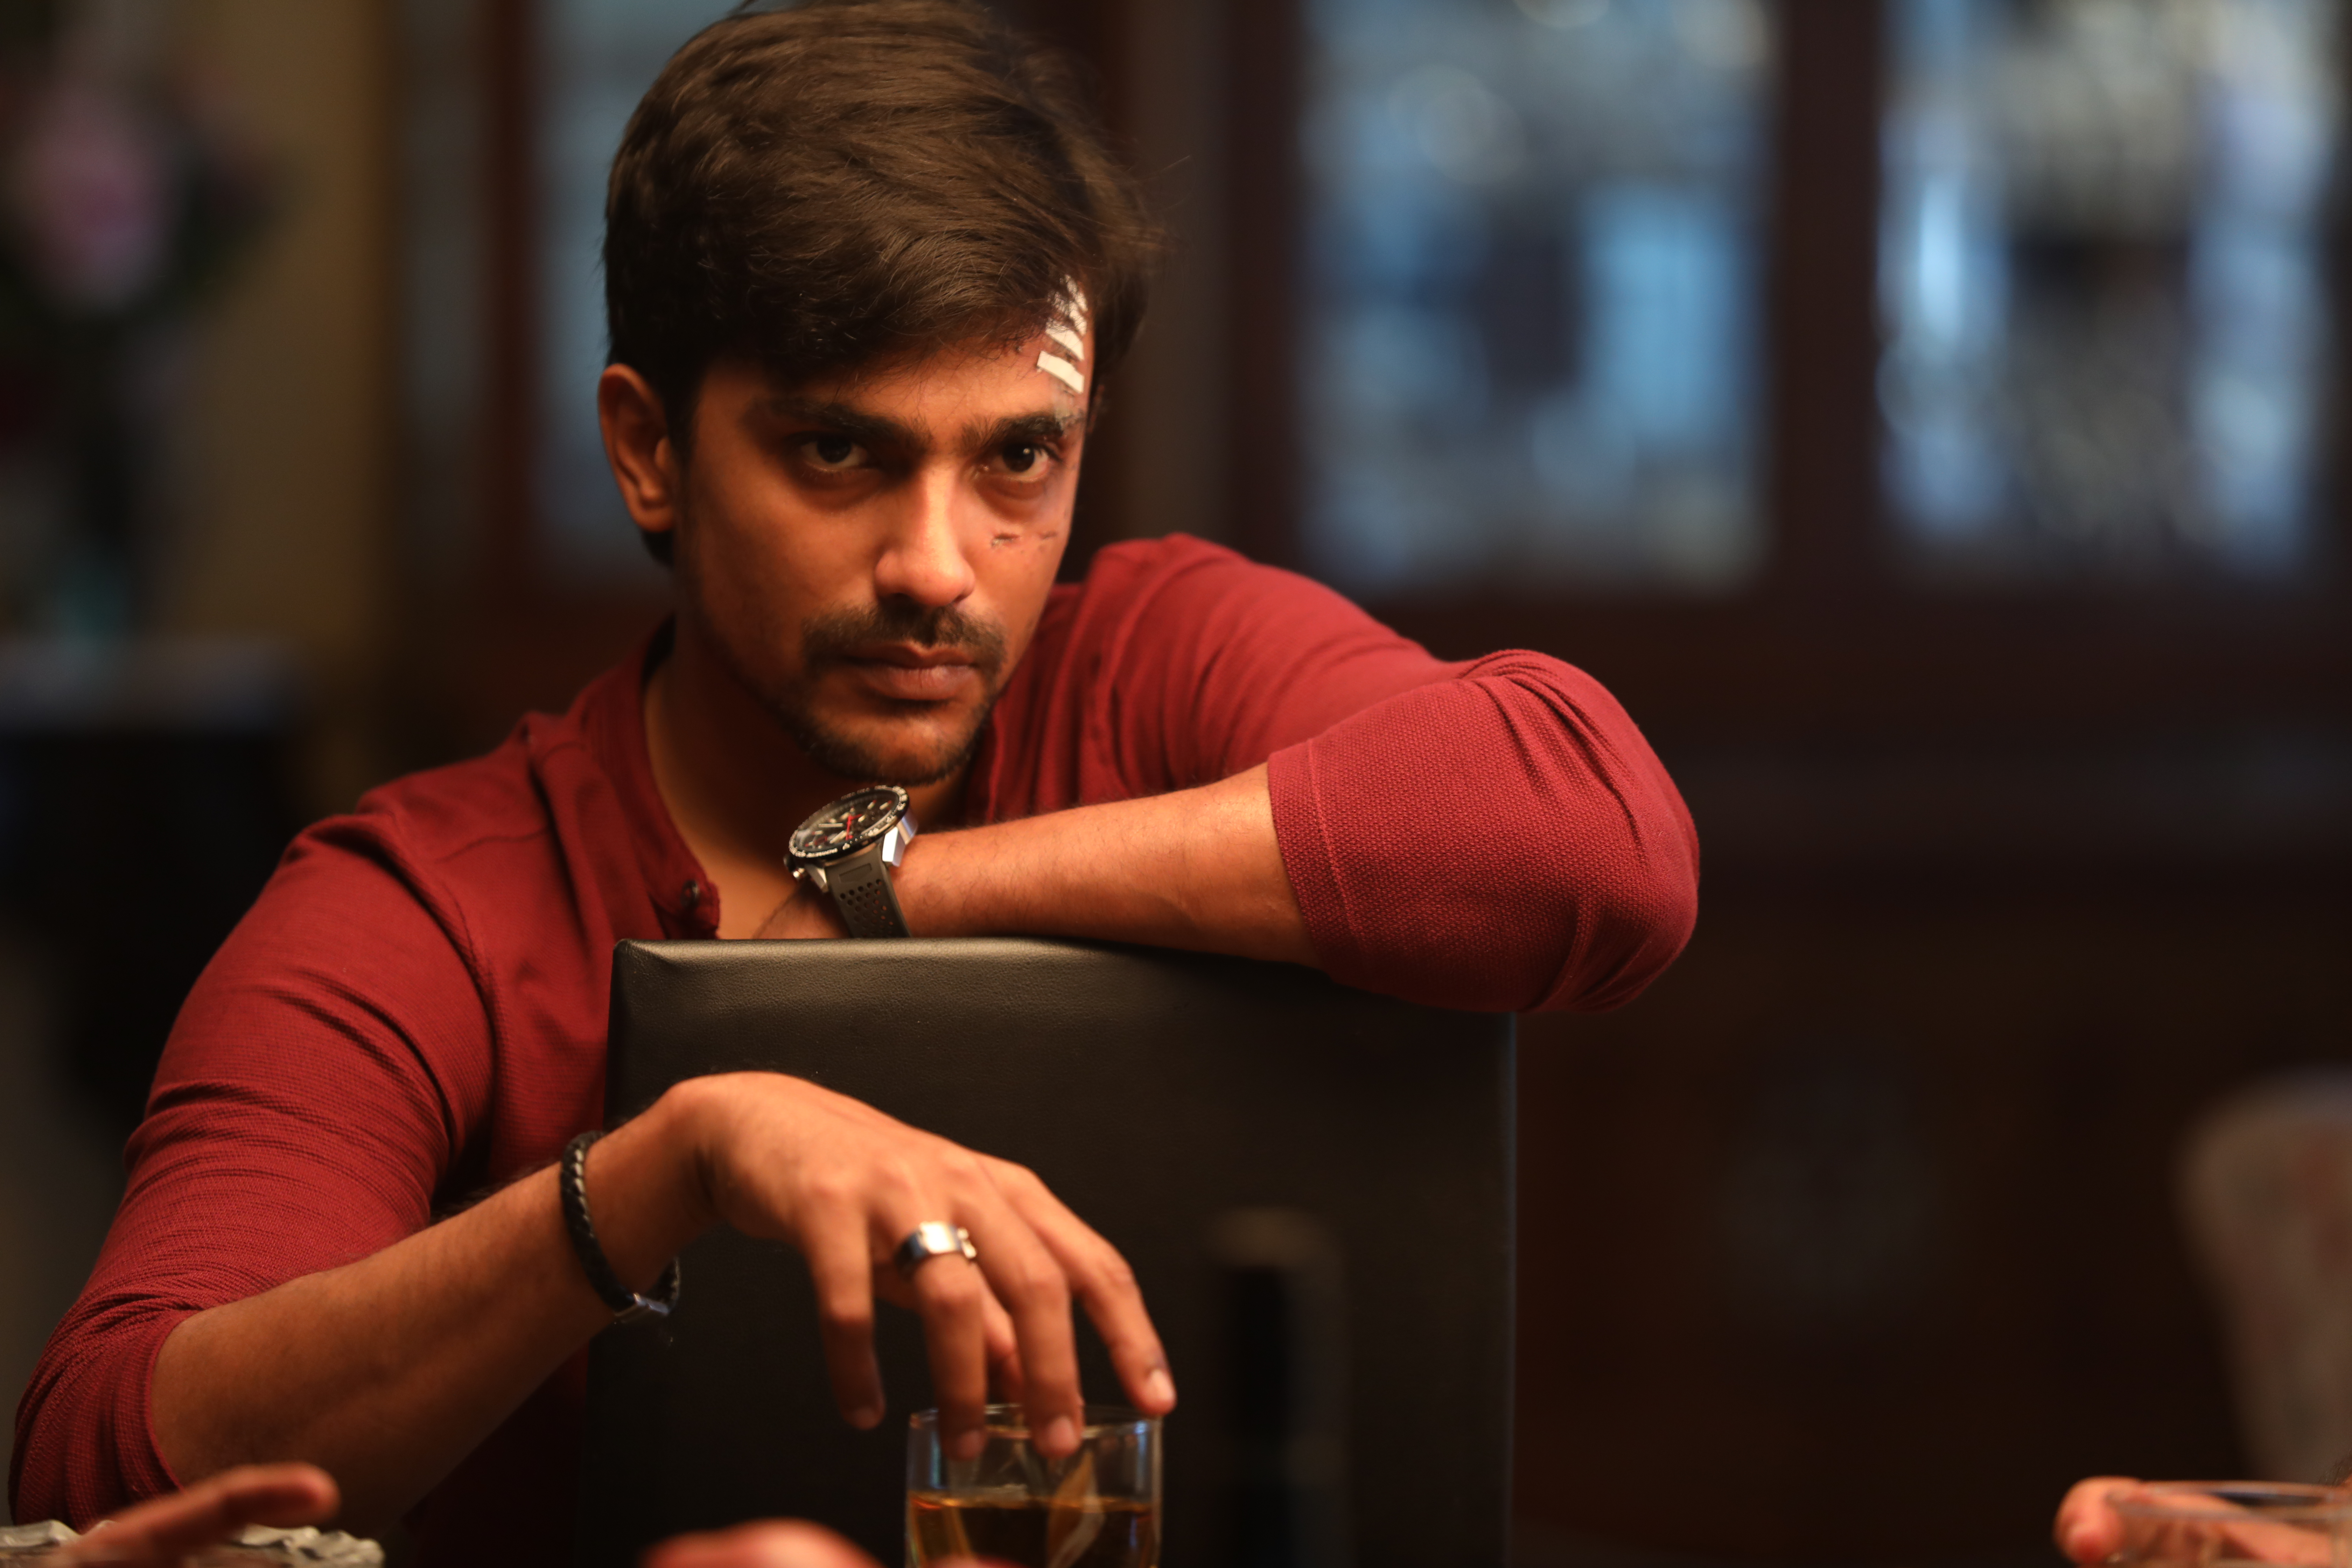 Arjun Chidambaram plays Adhik in Nerkonda Paarvai